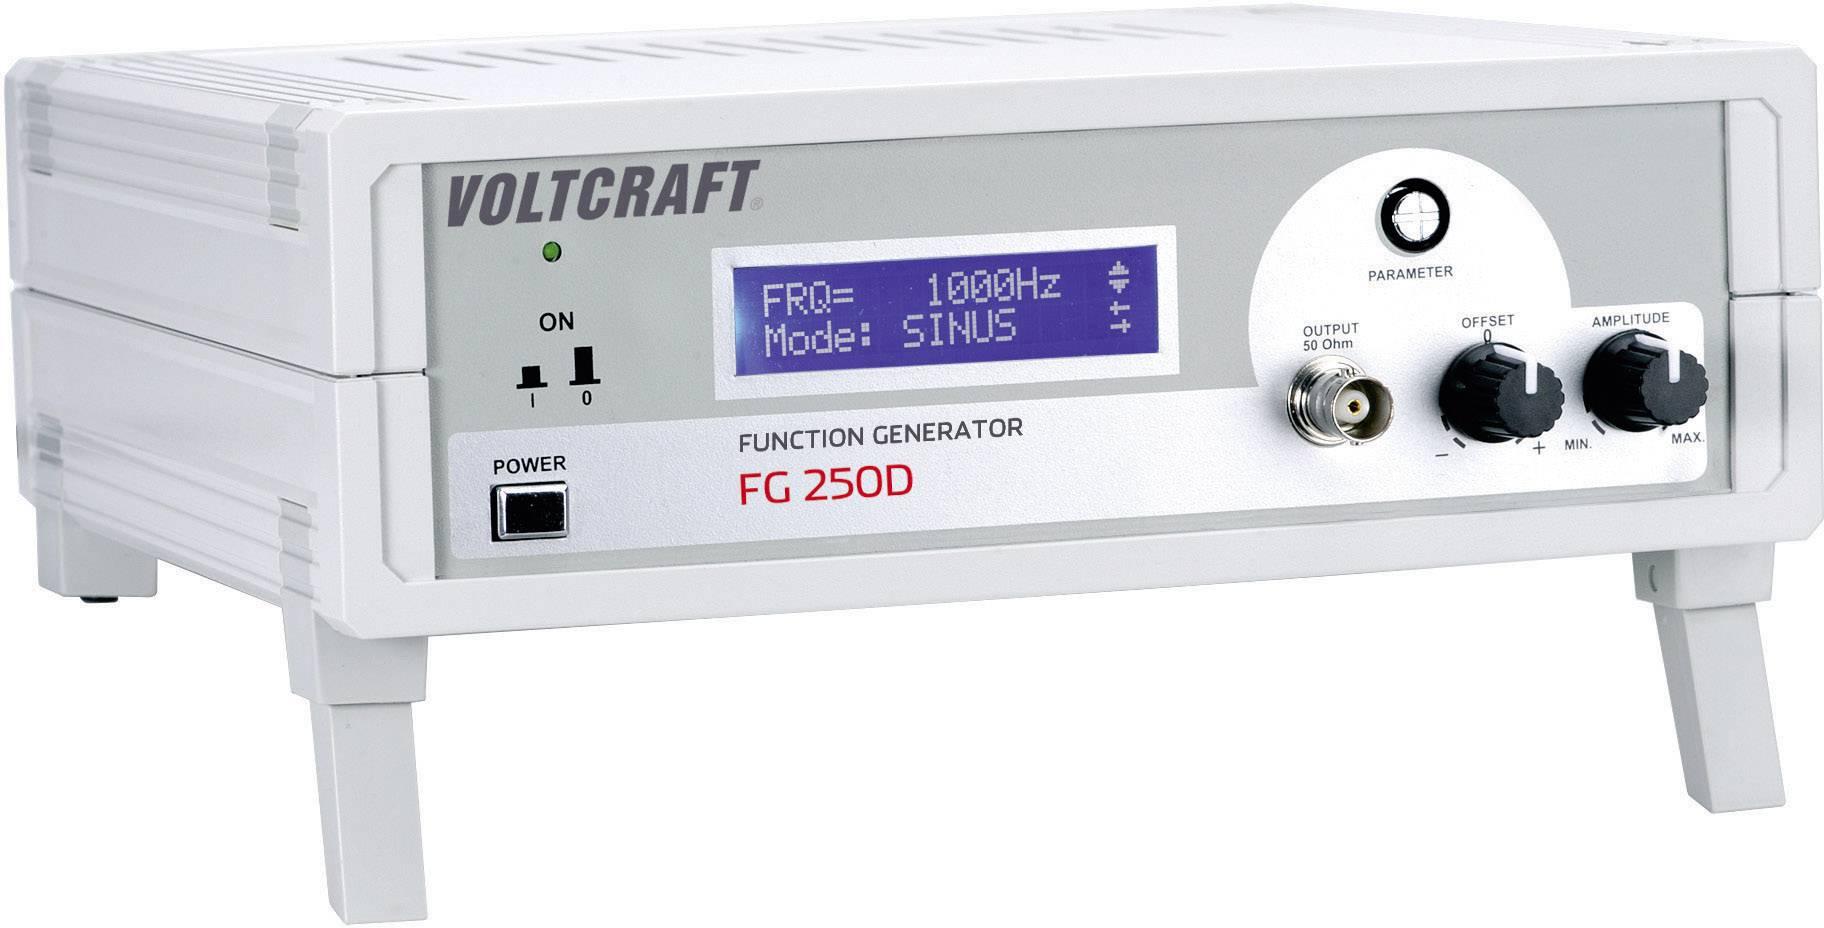 Generátor funkcí Voltcraft FG-250D, 1 Hz - 250 kHz